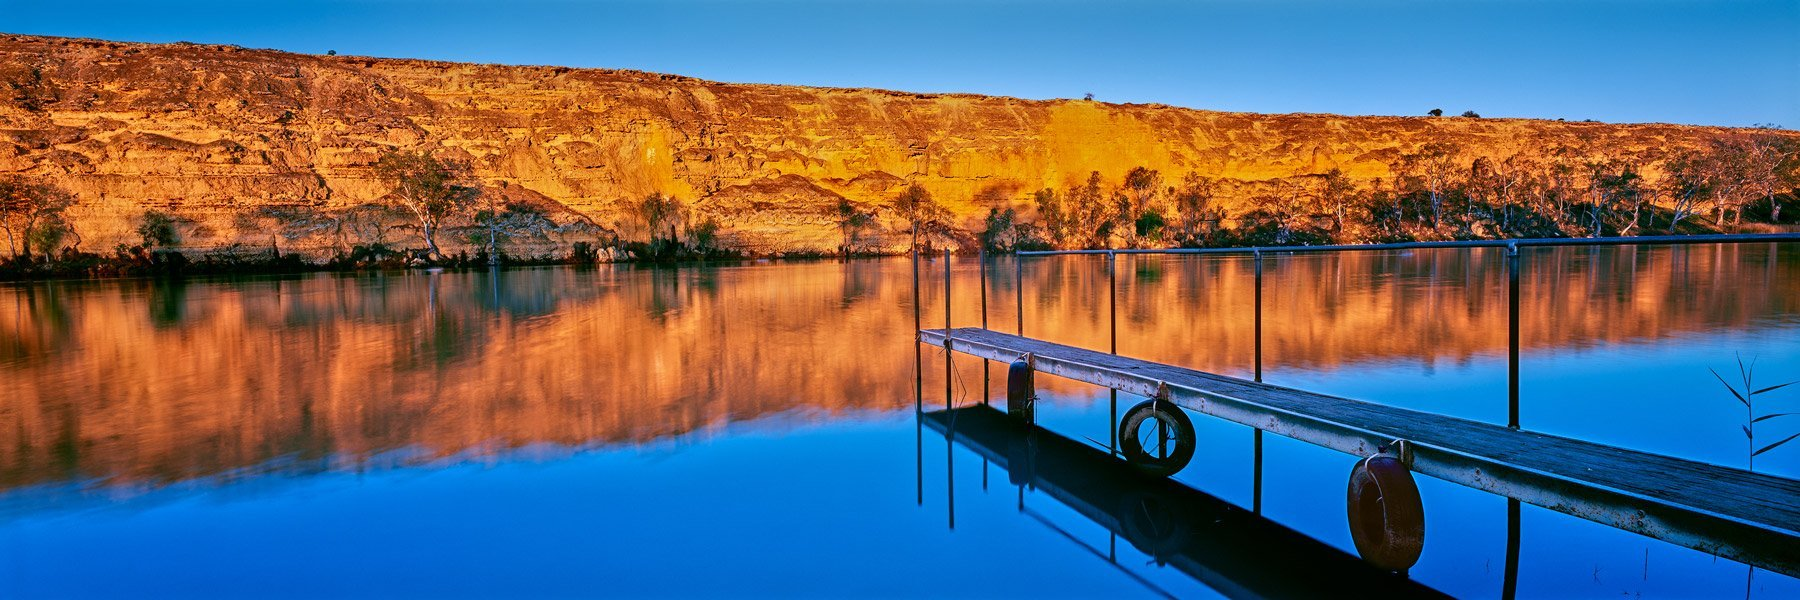 Flood's Jetty, Swan Reach, SA, Australia.